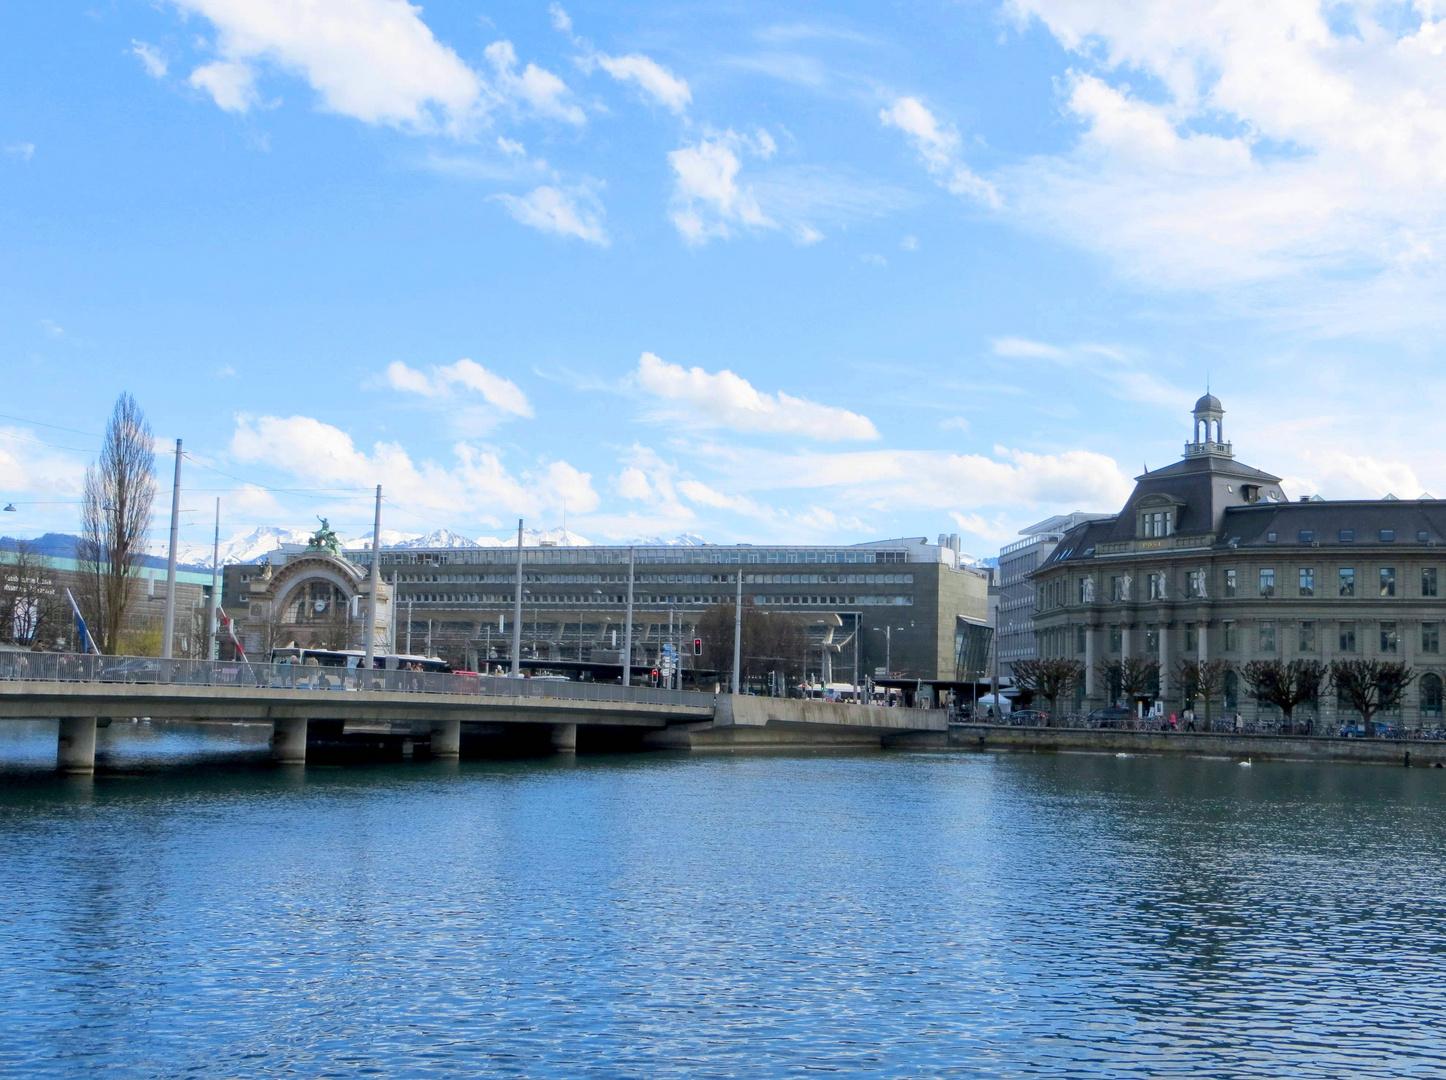 Seebrücke, Bahnhof & Hauptpost